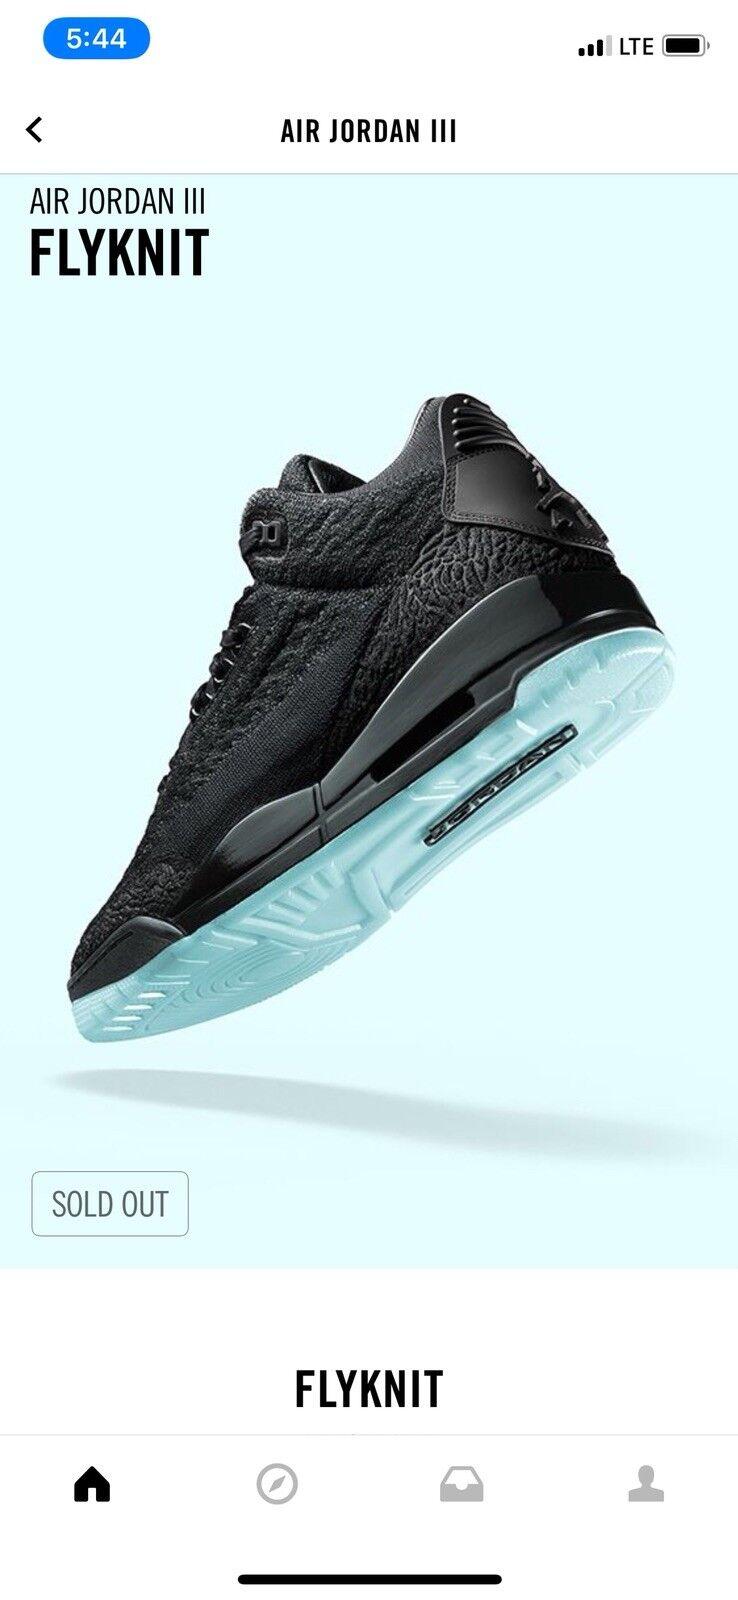 2018 Nike Air Jordan Retro 3 FLYKNIT BLACK ICE, SIze 8.5 Brand discount